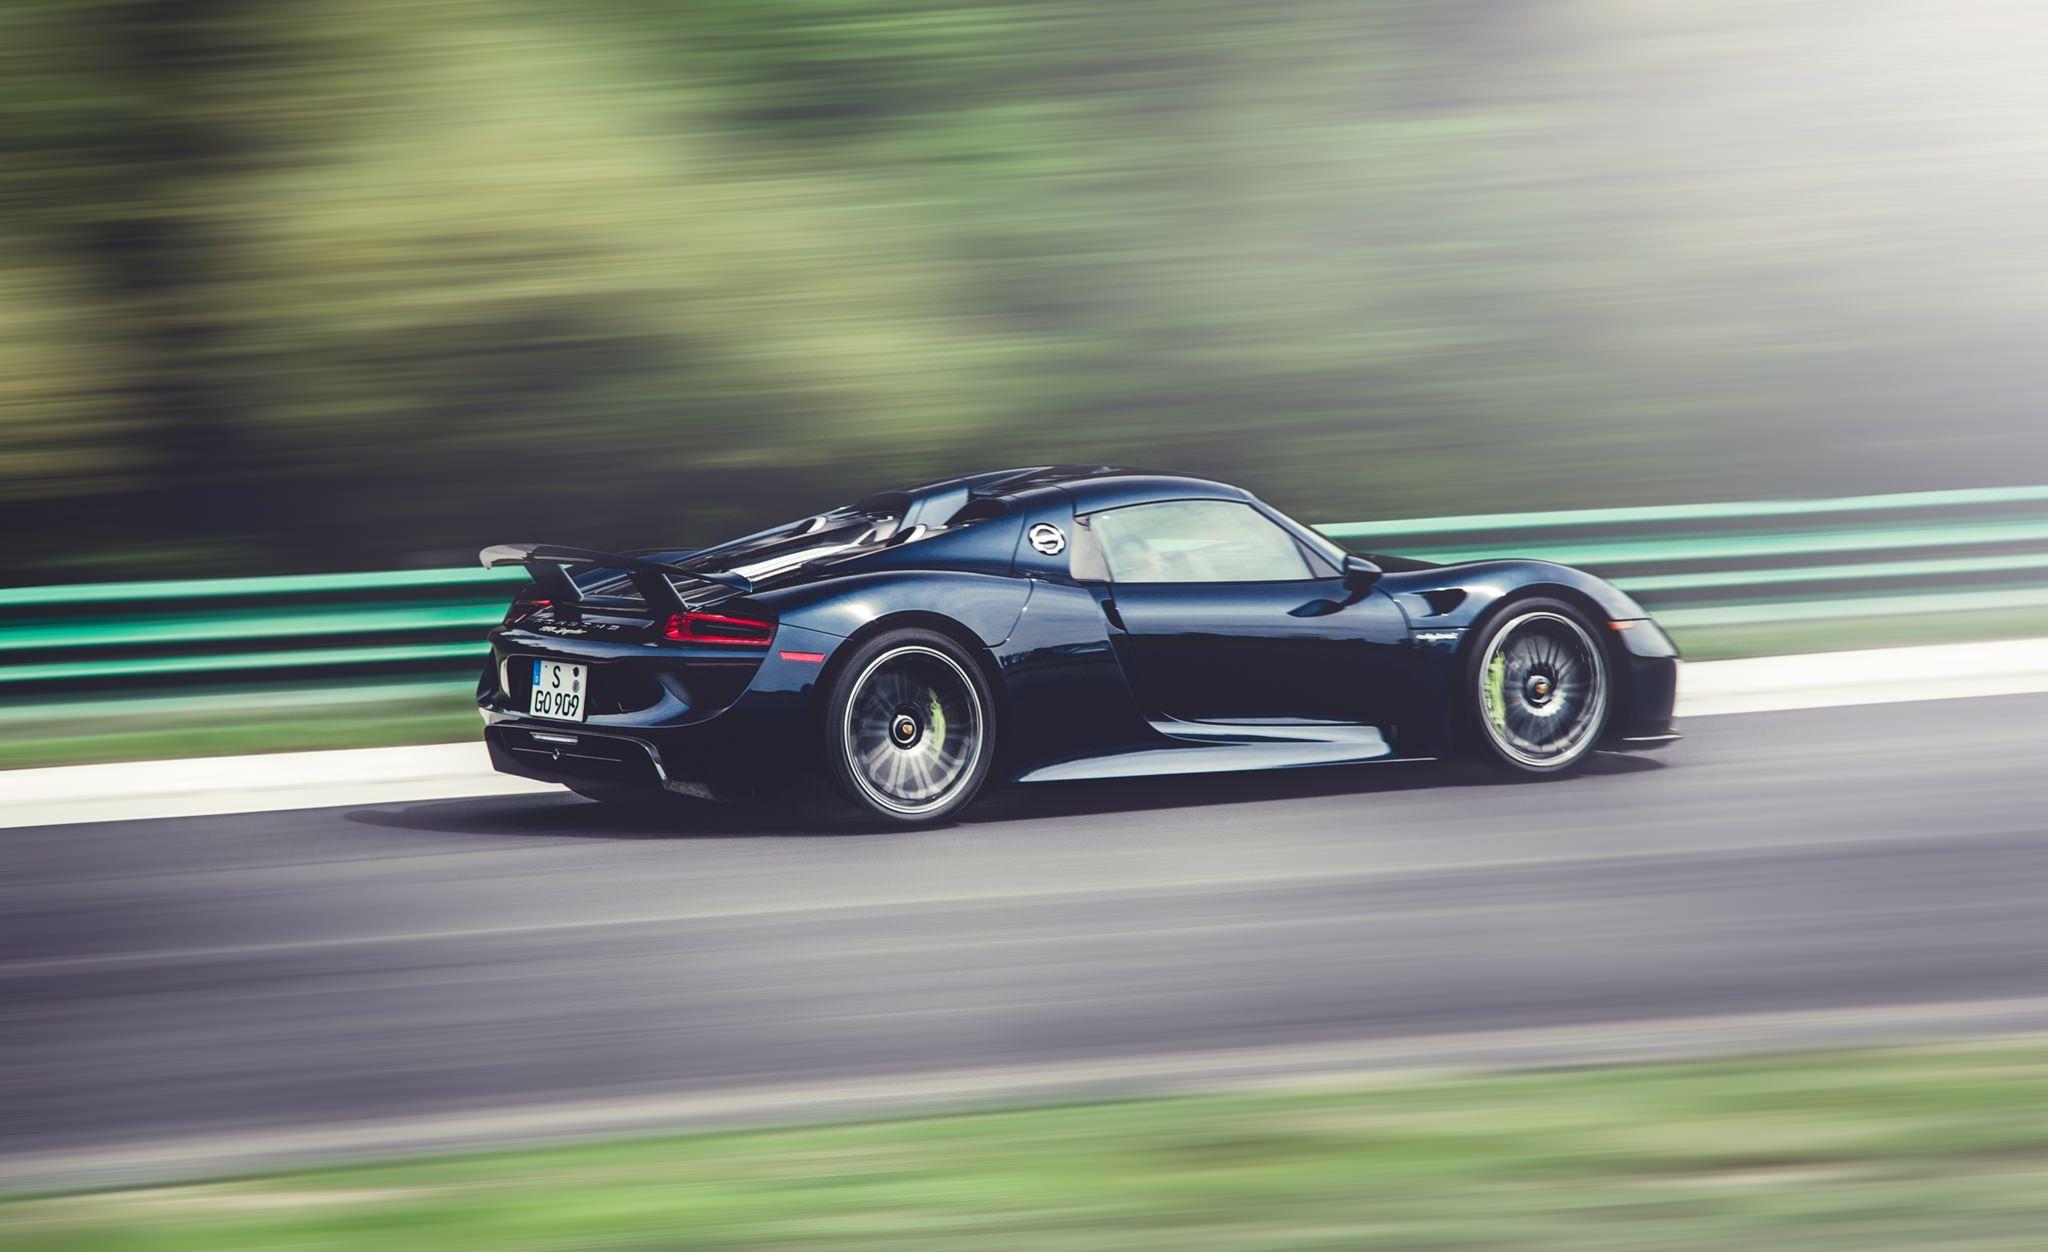 Dark Blue Porsche 918 Spyder Side Angle In Motion On Track